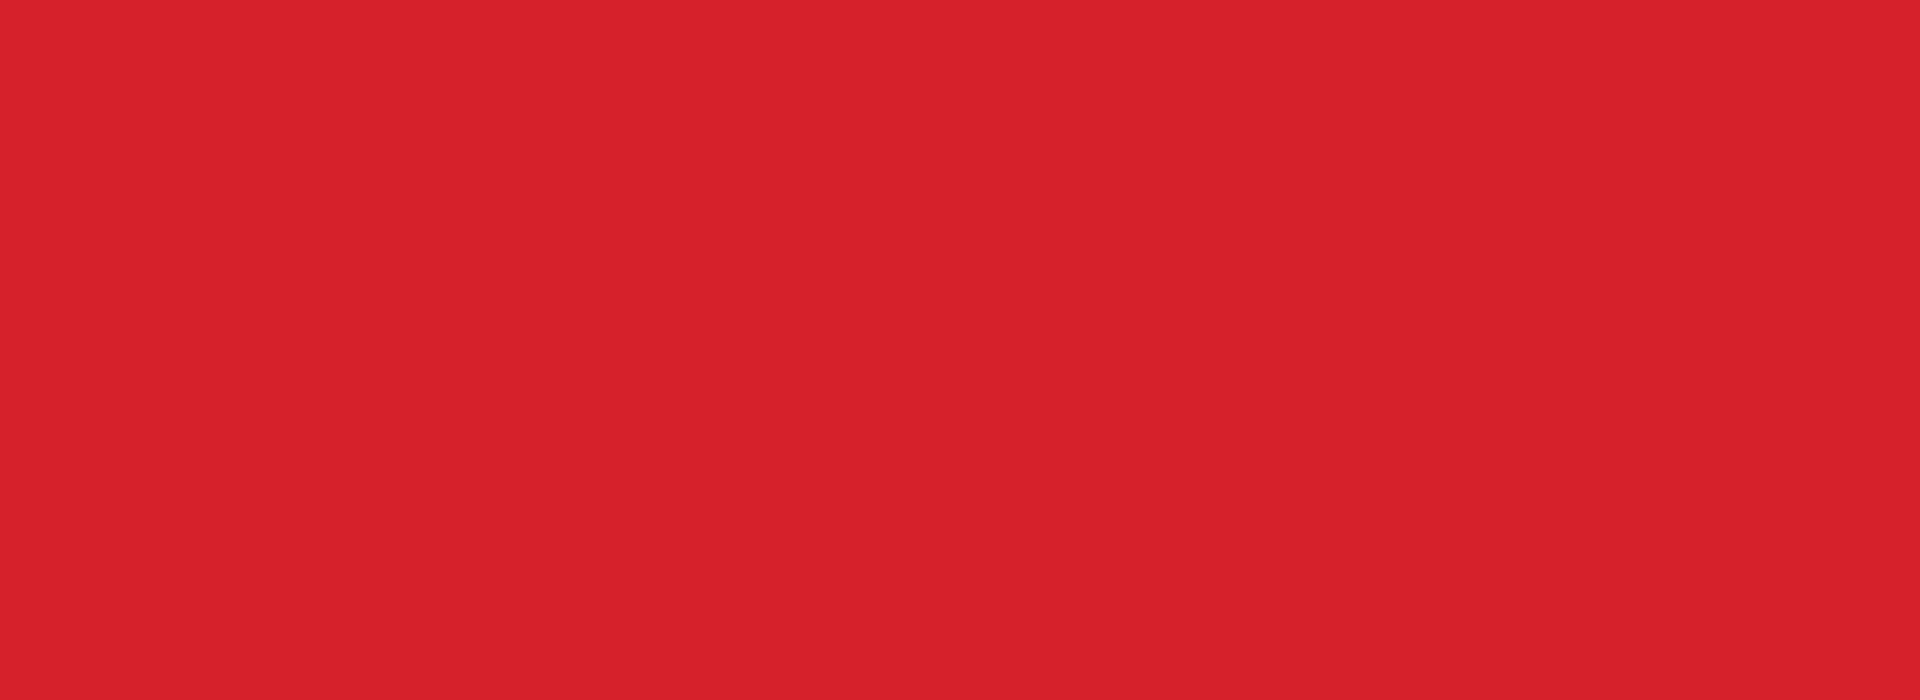 5×1000-arci-fondo-rosso